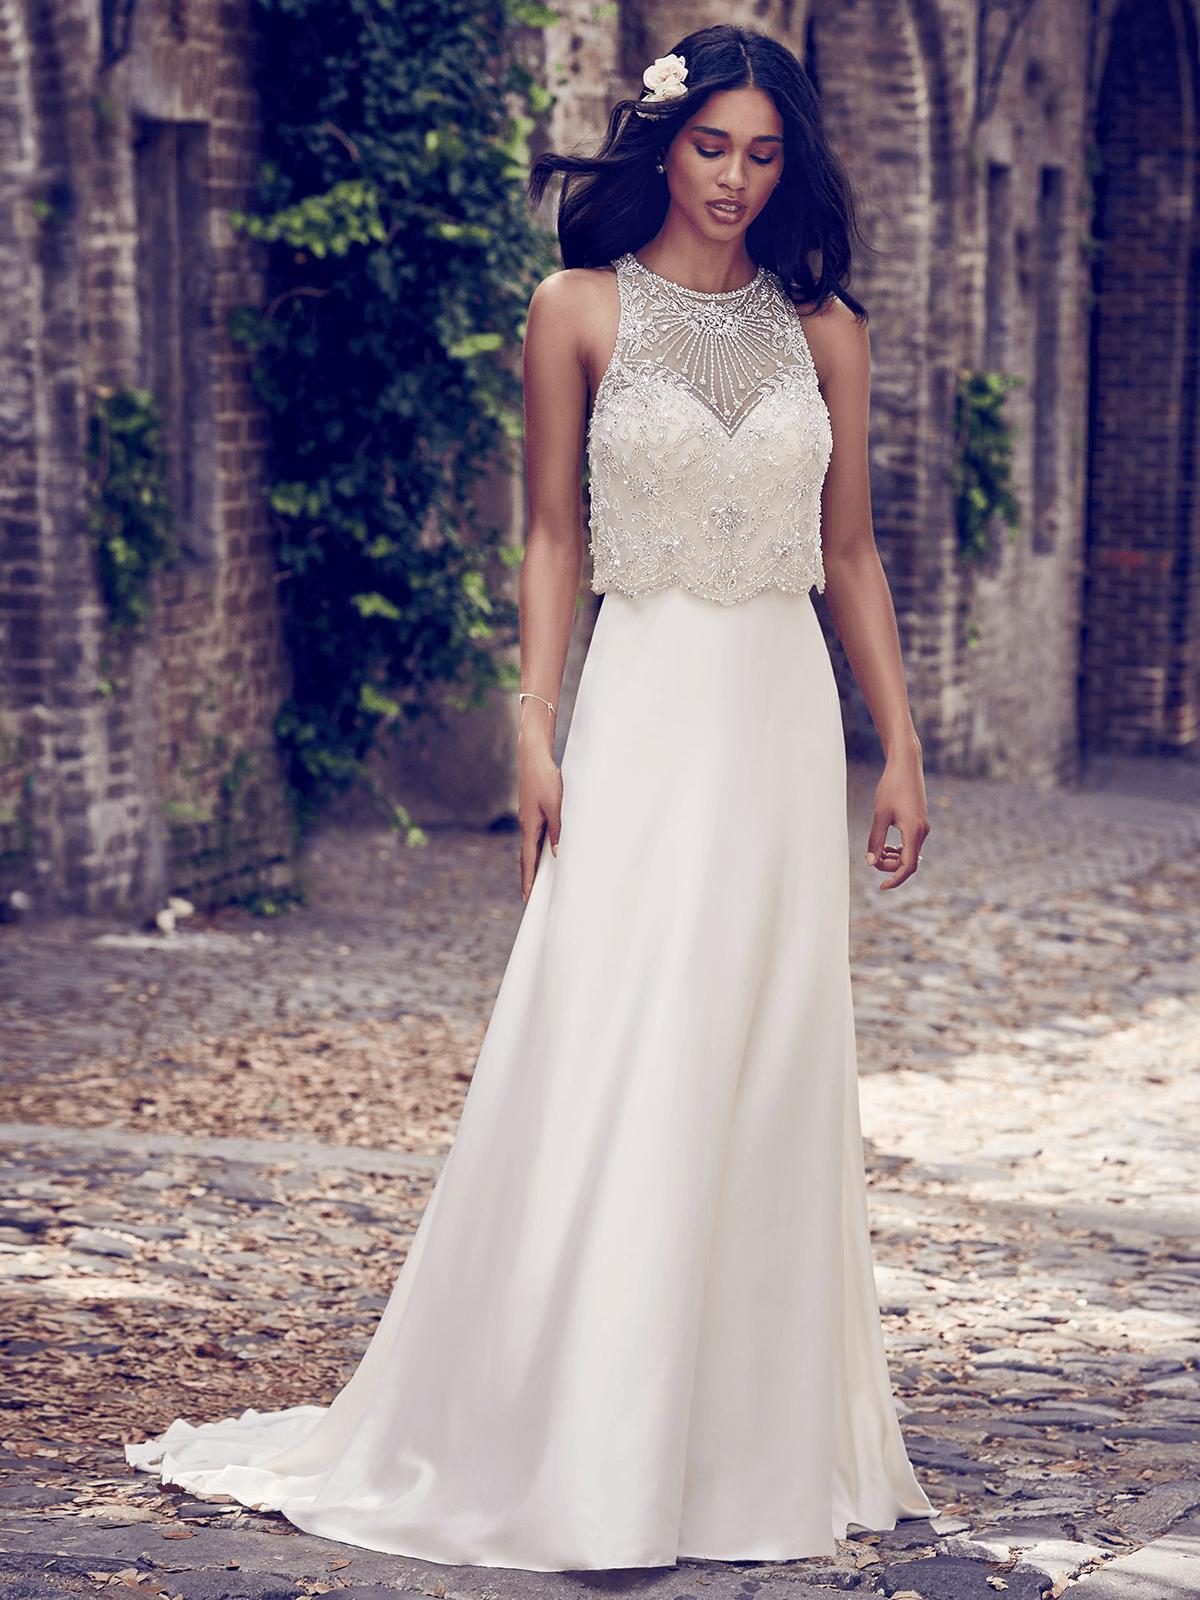 Maggie-Sottero-Wedding-Dress-Larkin-8MT450-Main